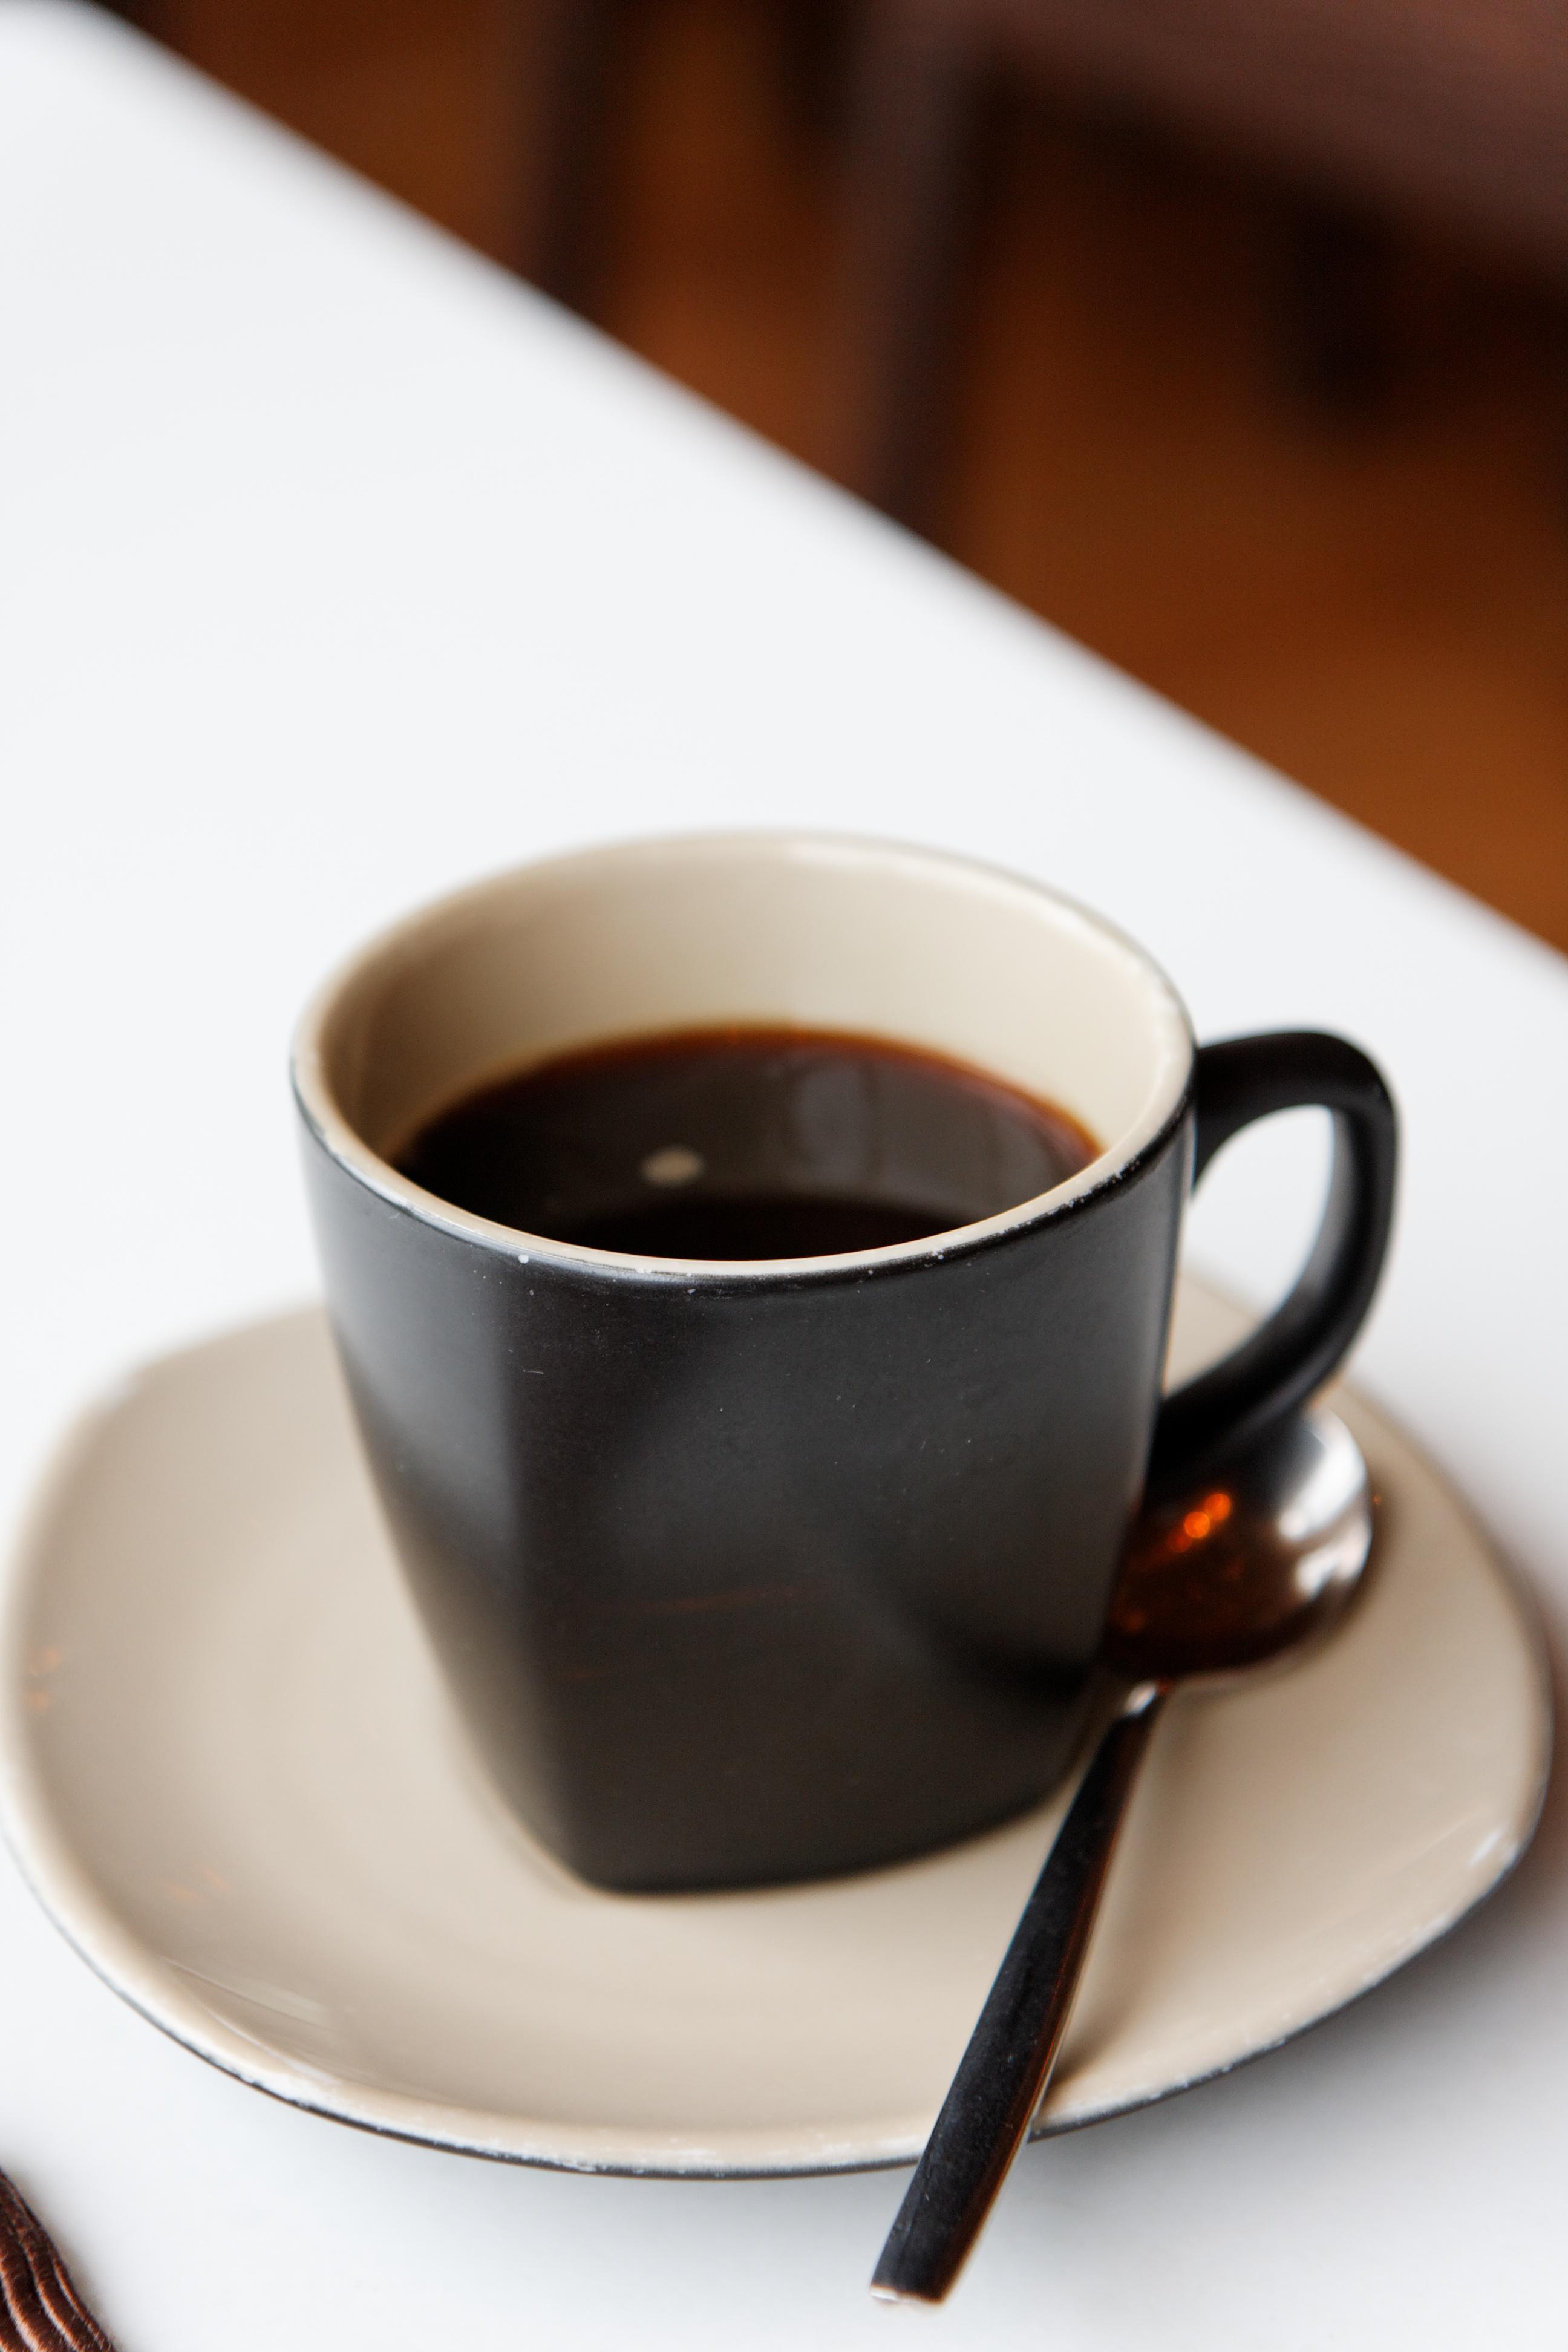 e8956e2b814e File Black coffee with saucer and spoon.jpg - Wikimedia Commons